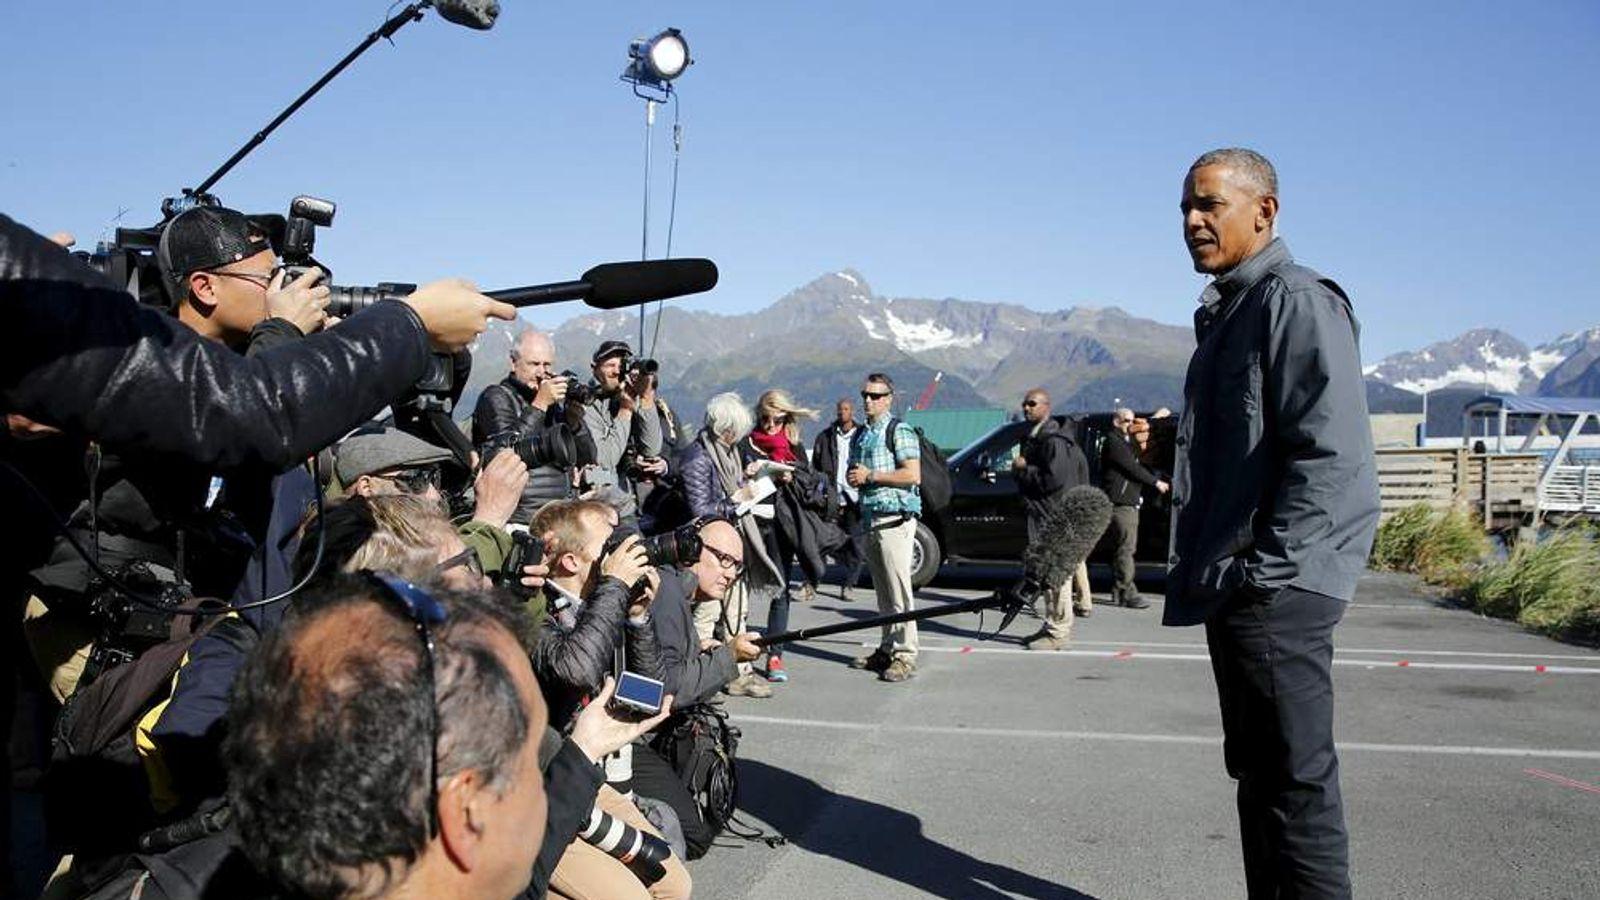 Obama delivers remarks before taking a boat tour of Kenai Fjords National Park in Seward, Alaska